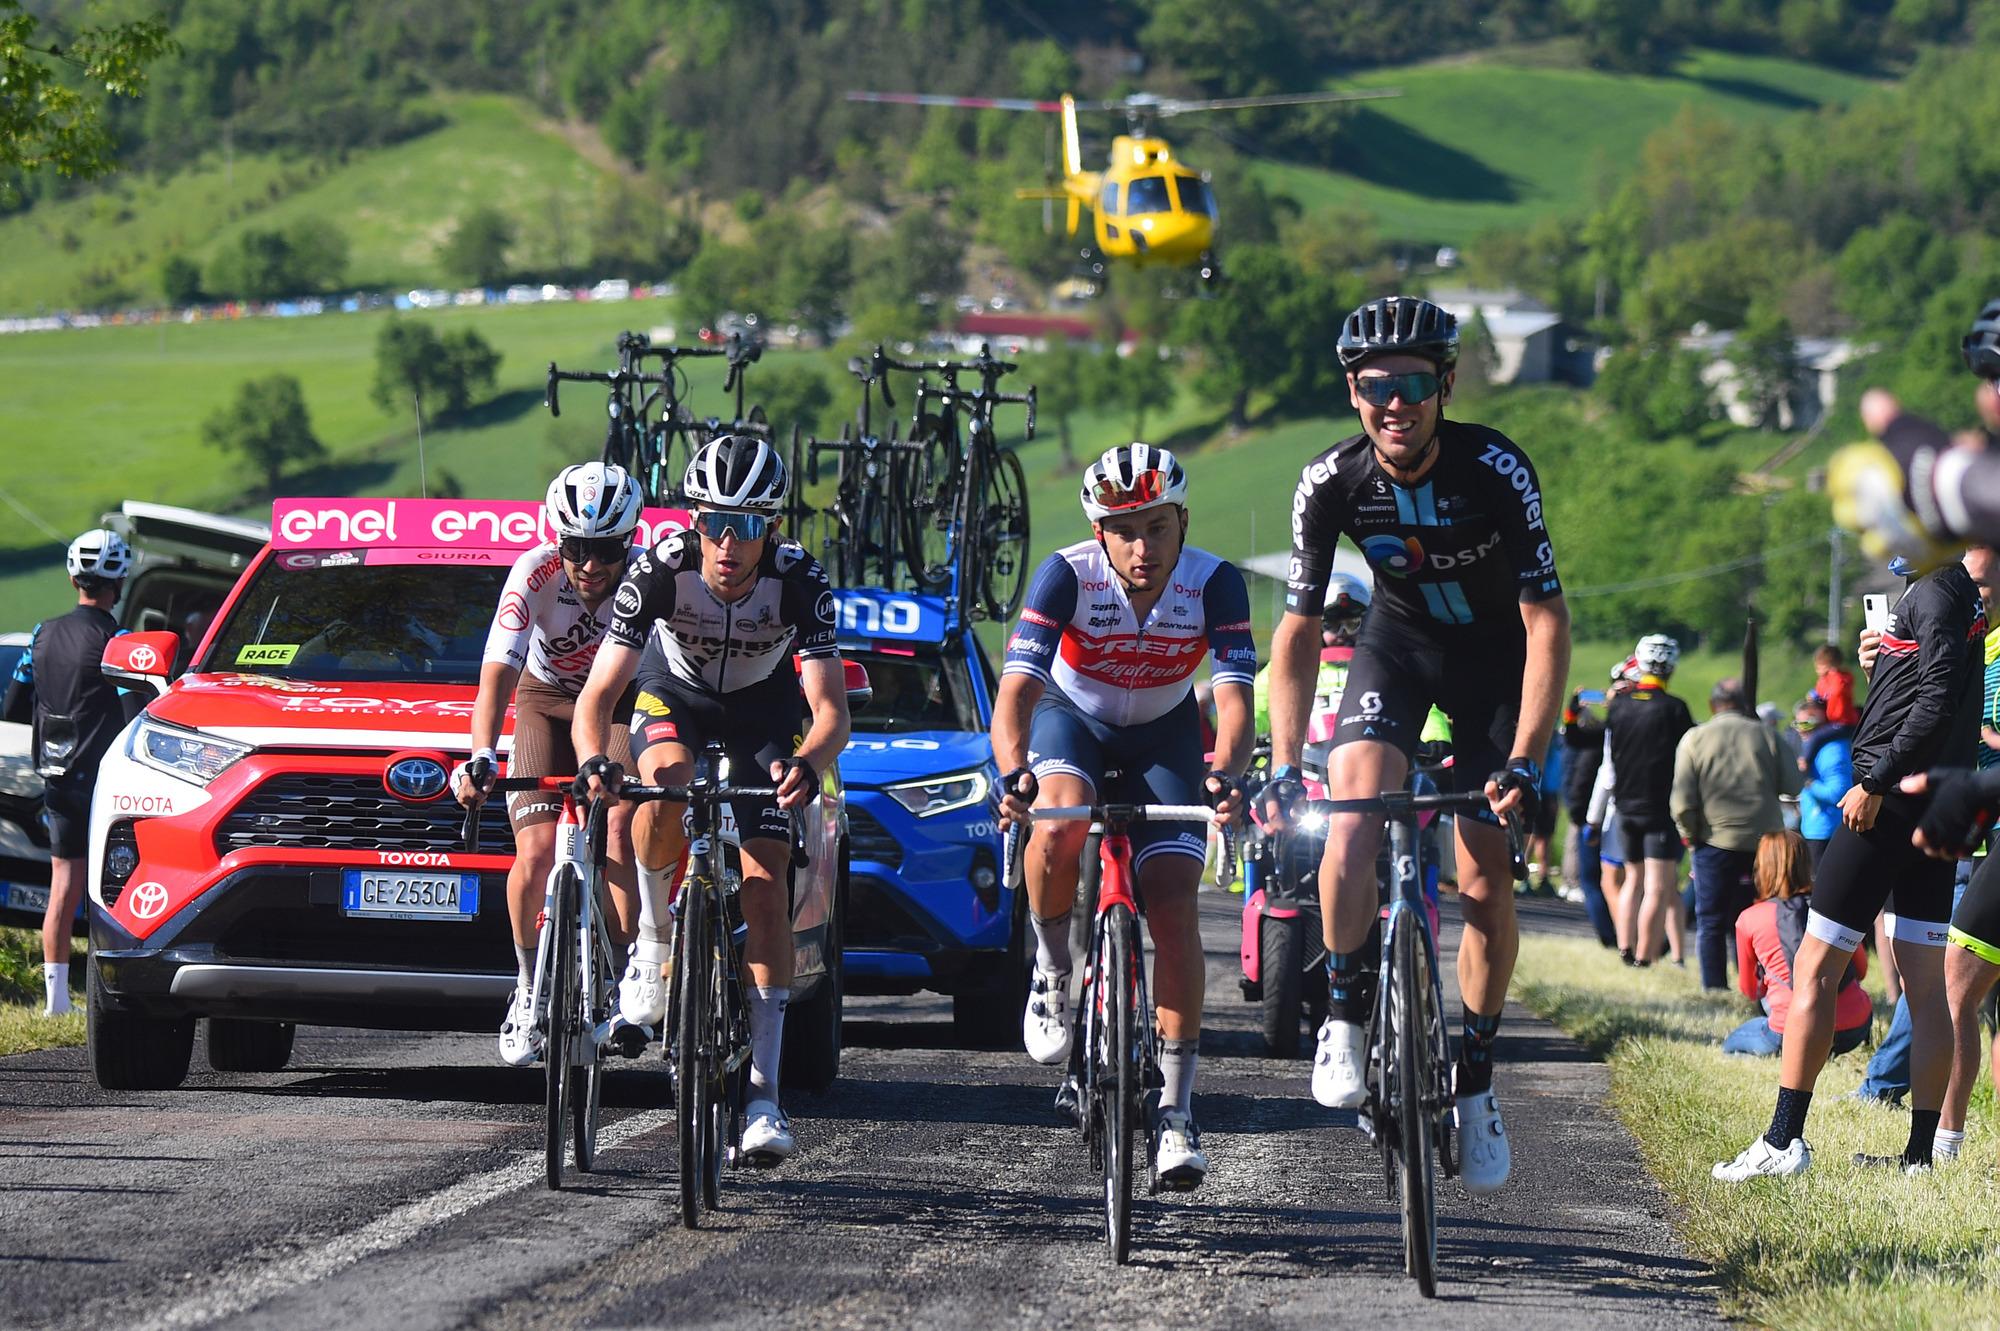 Giro d'Italia 2021 - 104th Edition - 12th stage Siena - Bagno di Romagna 212 km - 20/05/2021 - Andrea Vendrame (ITA - AG2R Citroen Team) - Christopher Hamilton (AUS - Team DSM) - Gianluca Brambilla (ITA - Trek - Segafredo) - photo Dario Belingheri/BettiniPhoto©2021